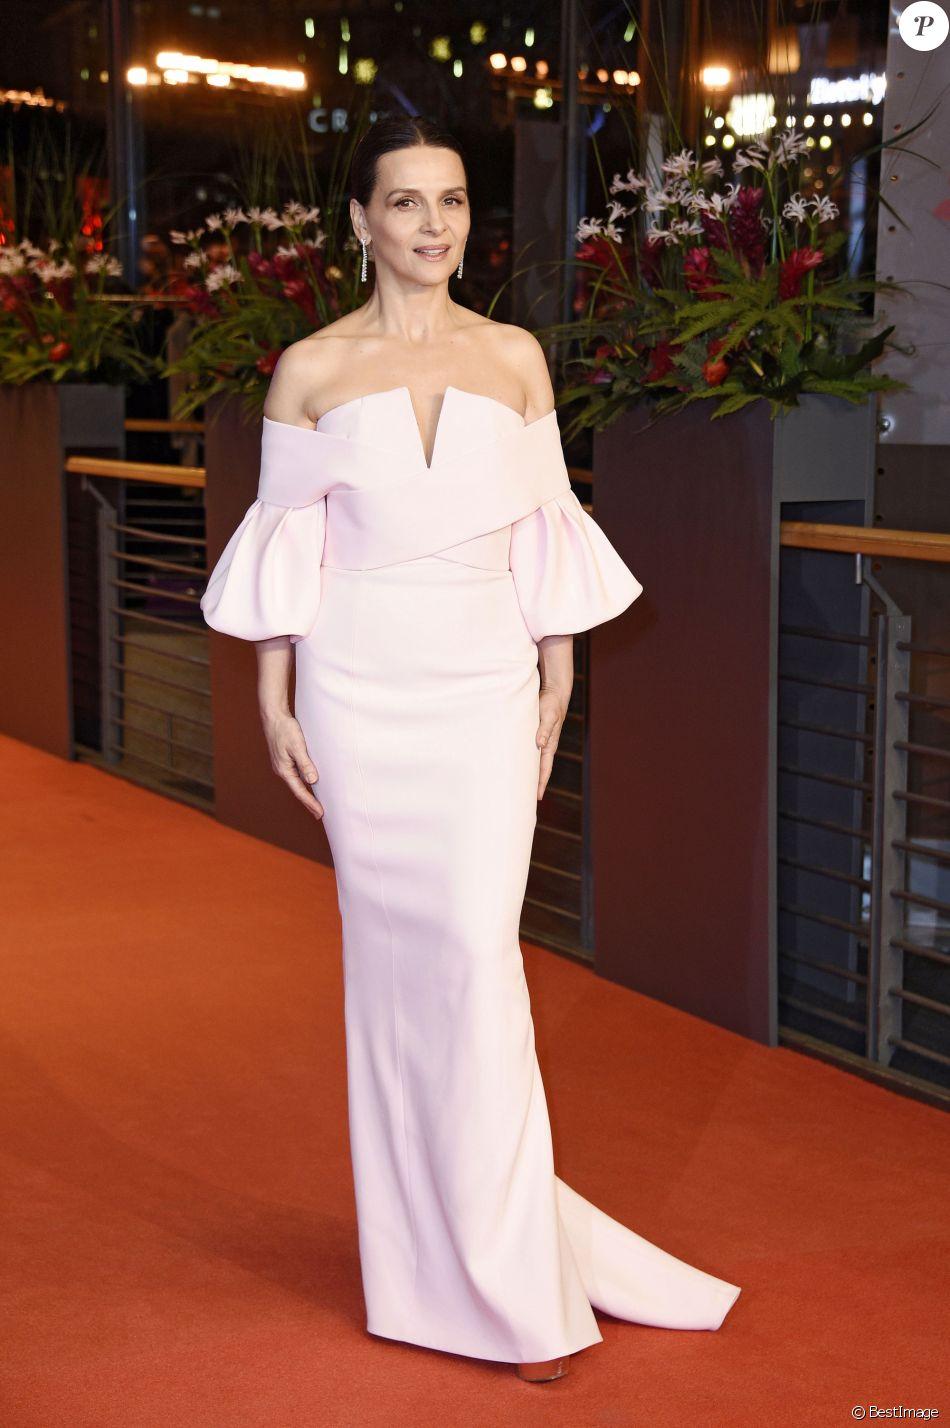 Juliette Binoche (Robe Balmain, bijoux Chopard) - Cérémonie de clôture du 69ème Festival International du Film de Berlin (Berlinale) le 16 février 2019 16/02/2019 - Berlin